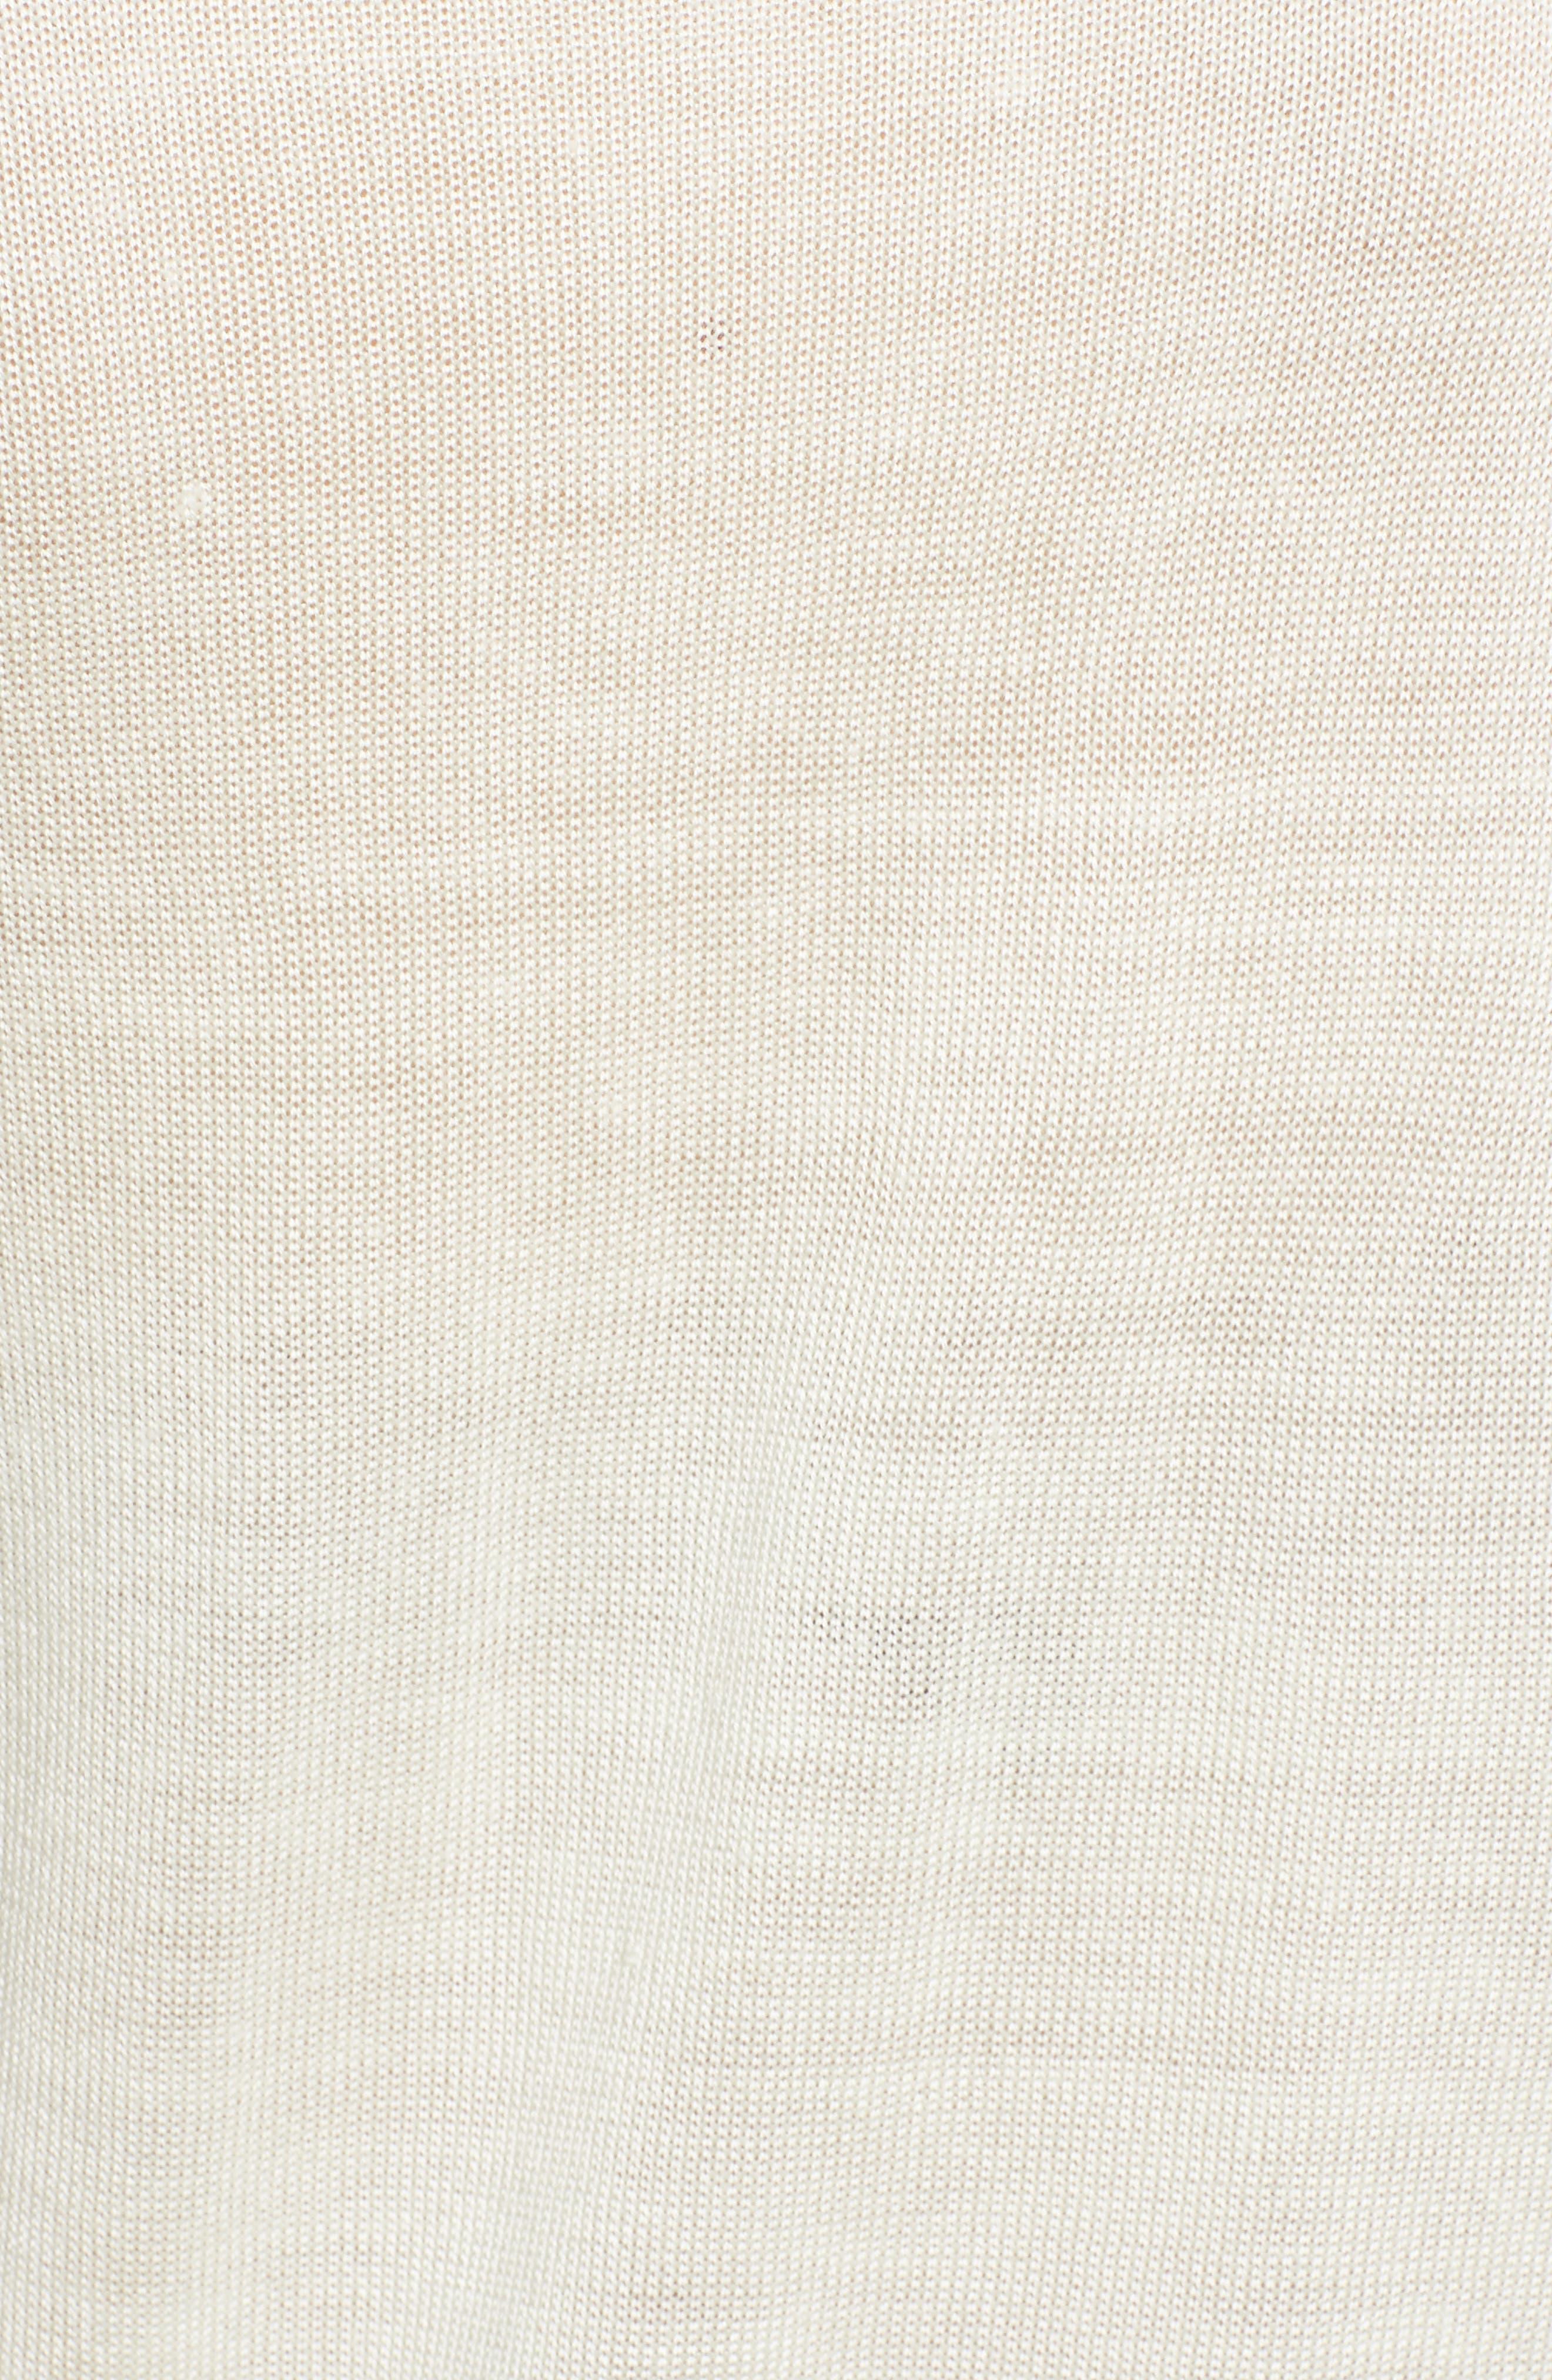 Cutout Sweatshirt,                             Alternate thumbnail 5, color,                             White